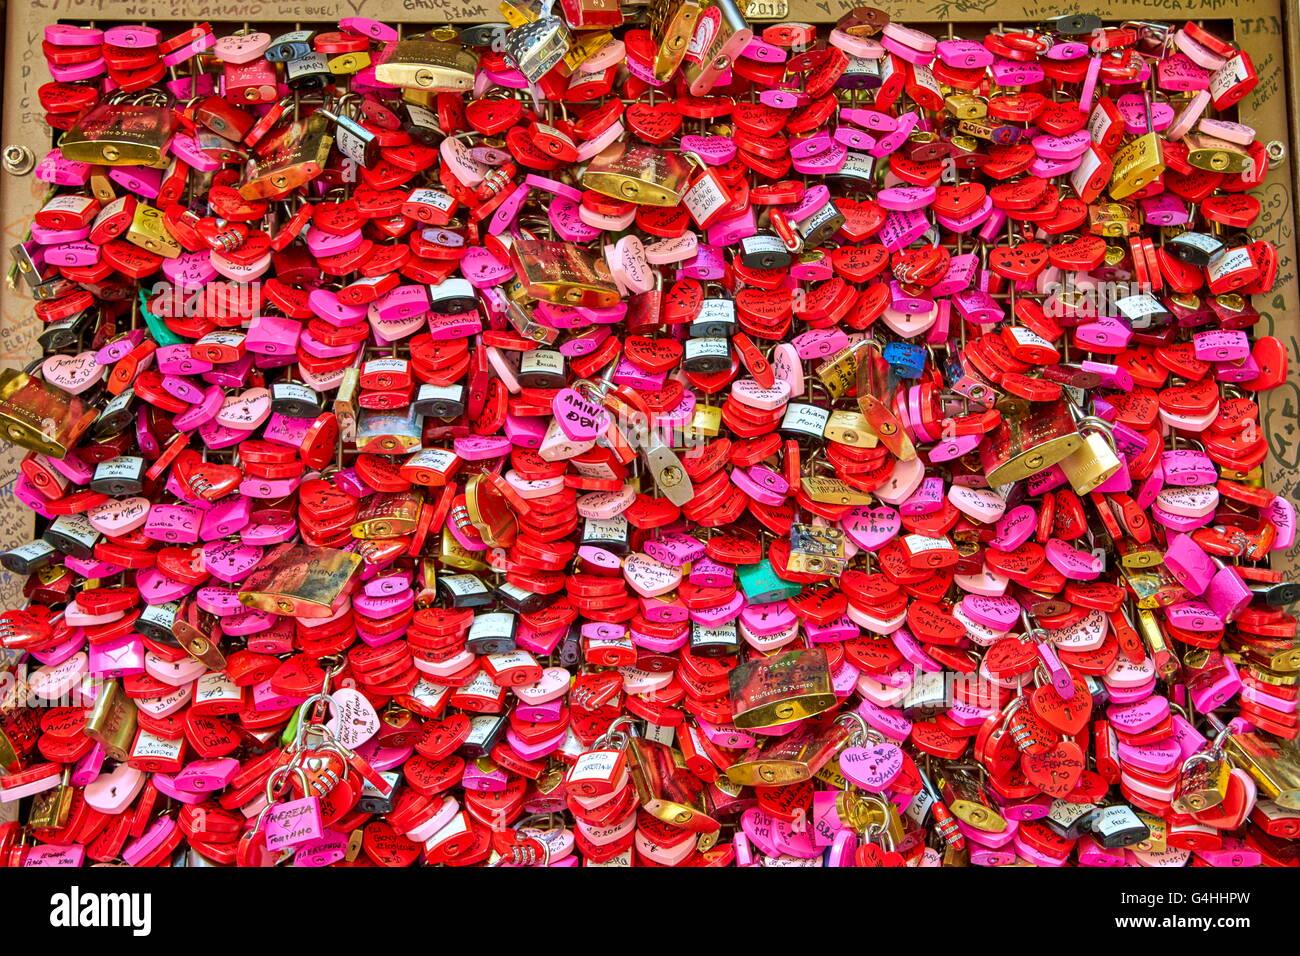 Lave, Vorhängeschlösser, Juliet House, Romeo und Julia, Verona, Venetien, Italien Stockbild